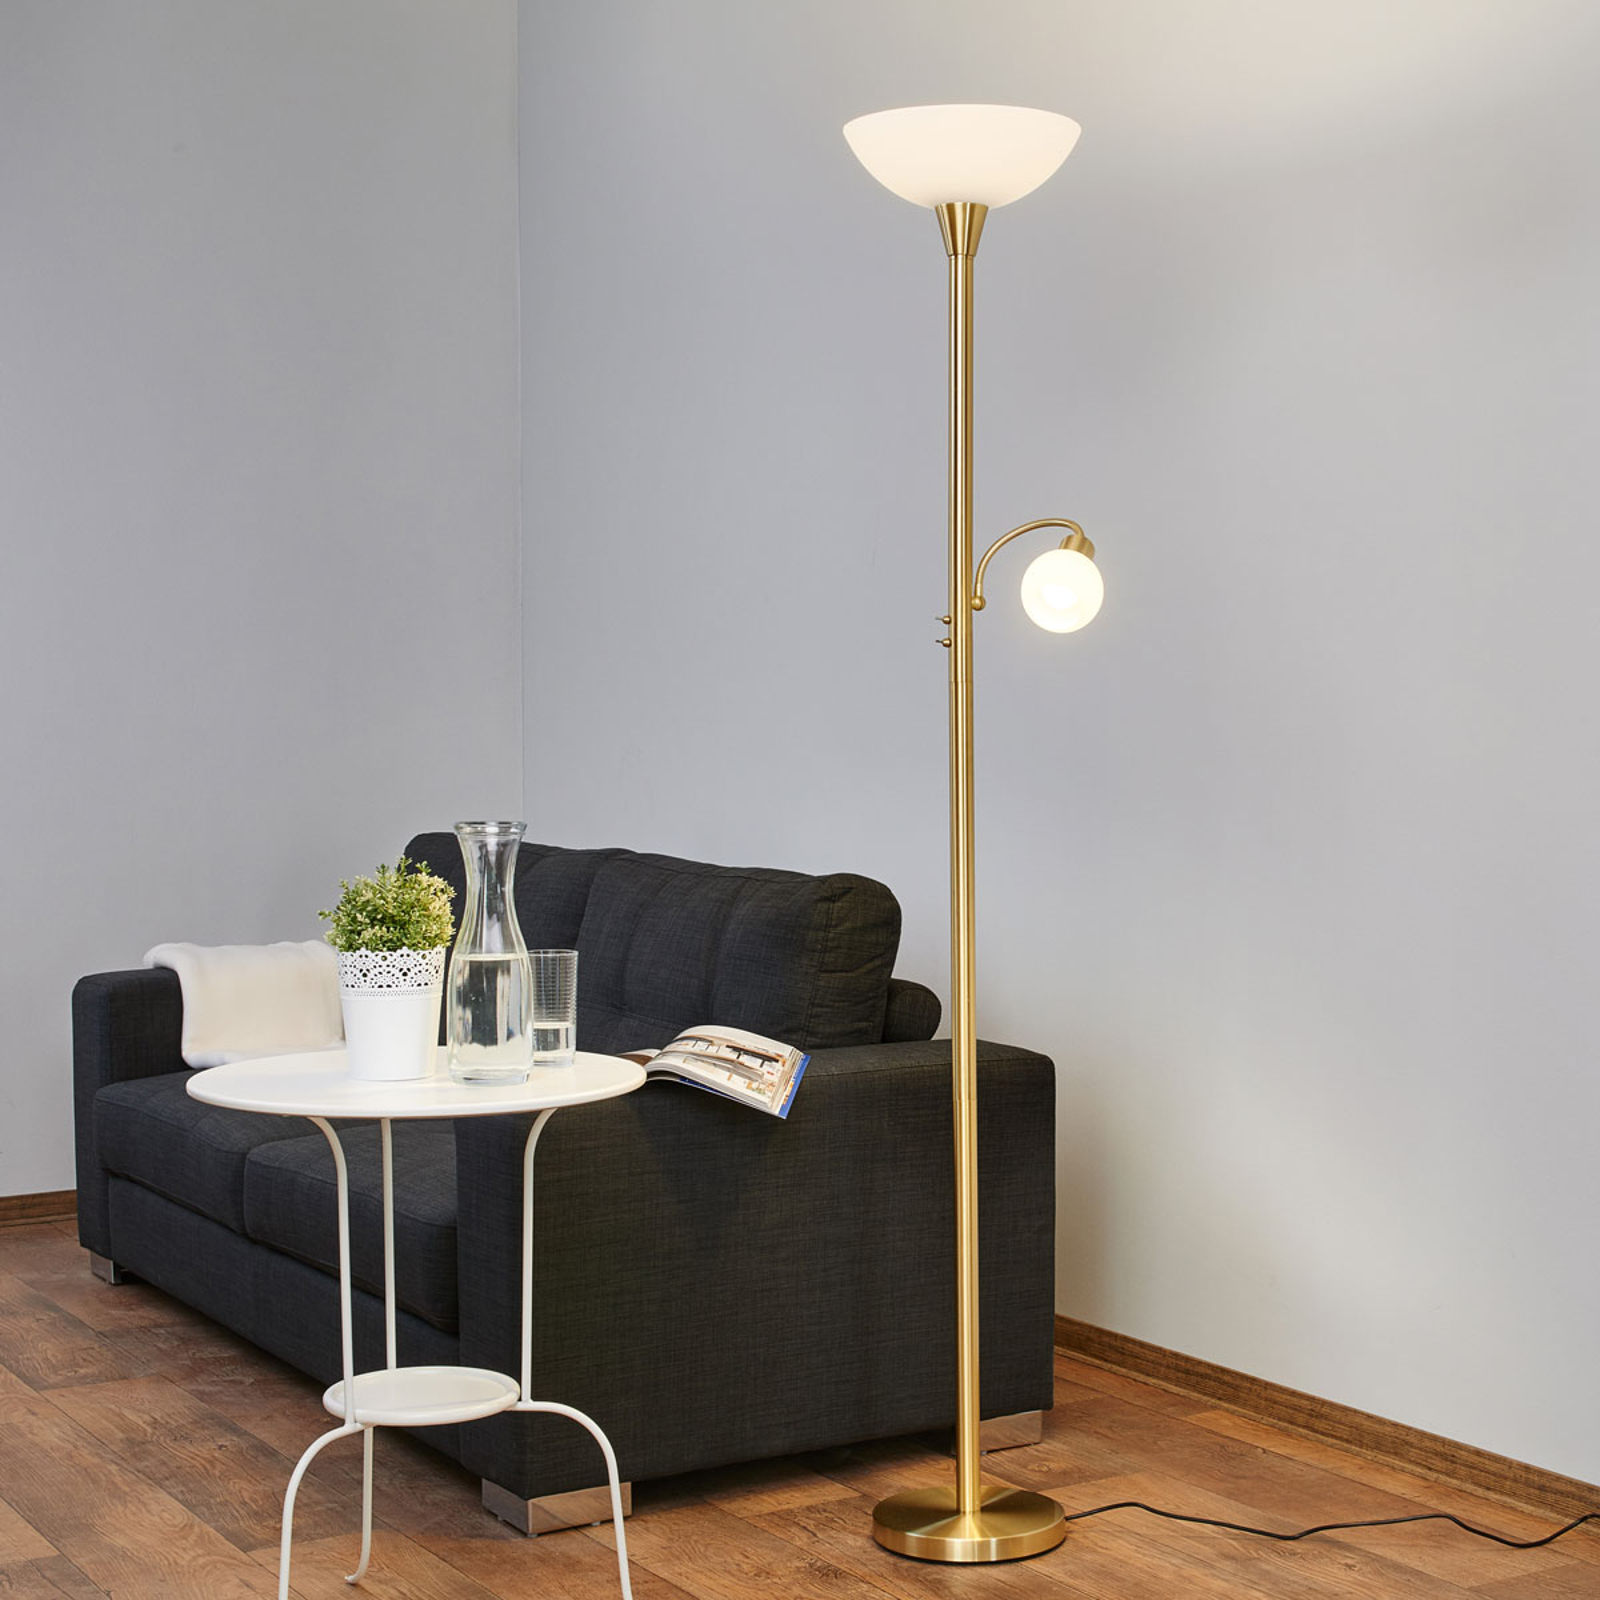 LED-Deckenfluter Elaina mit Leselicht, messing